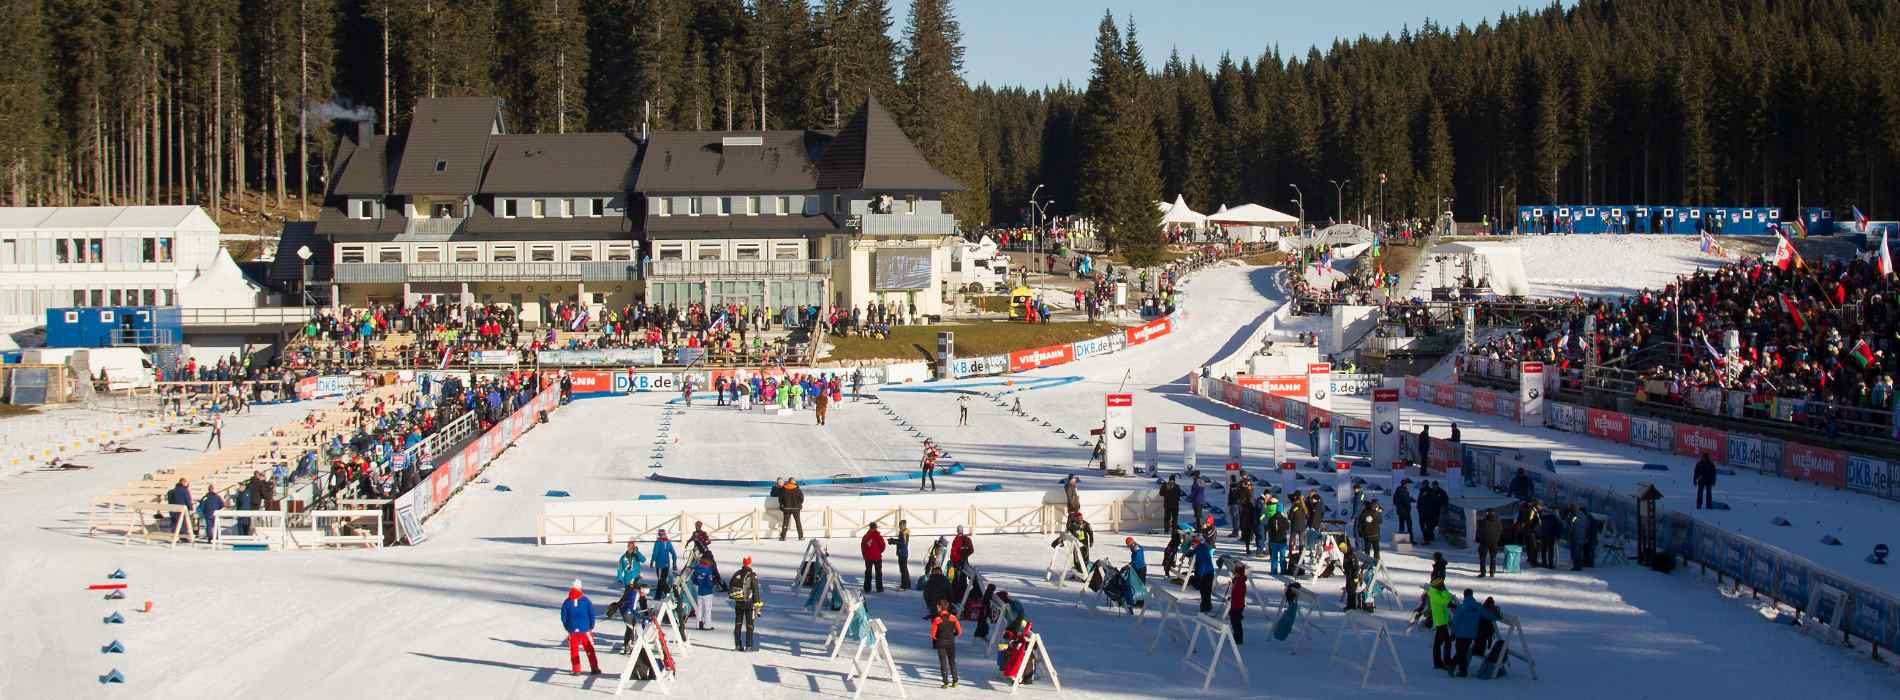 Biathlonort